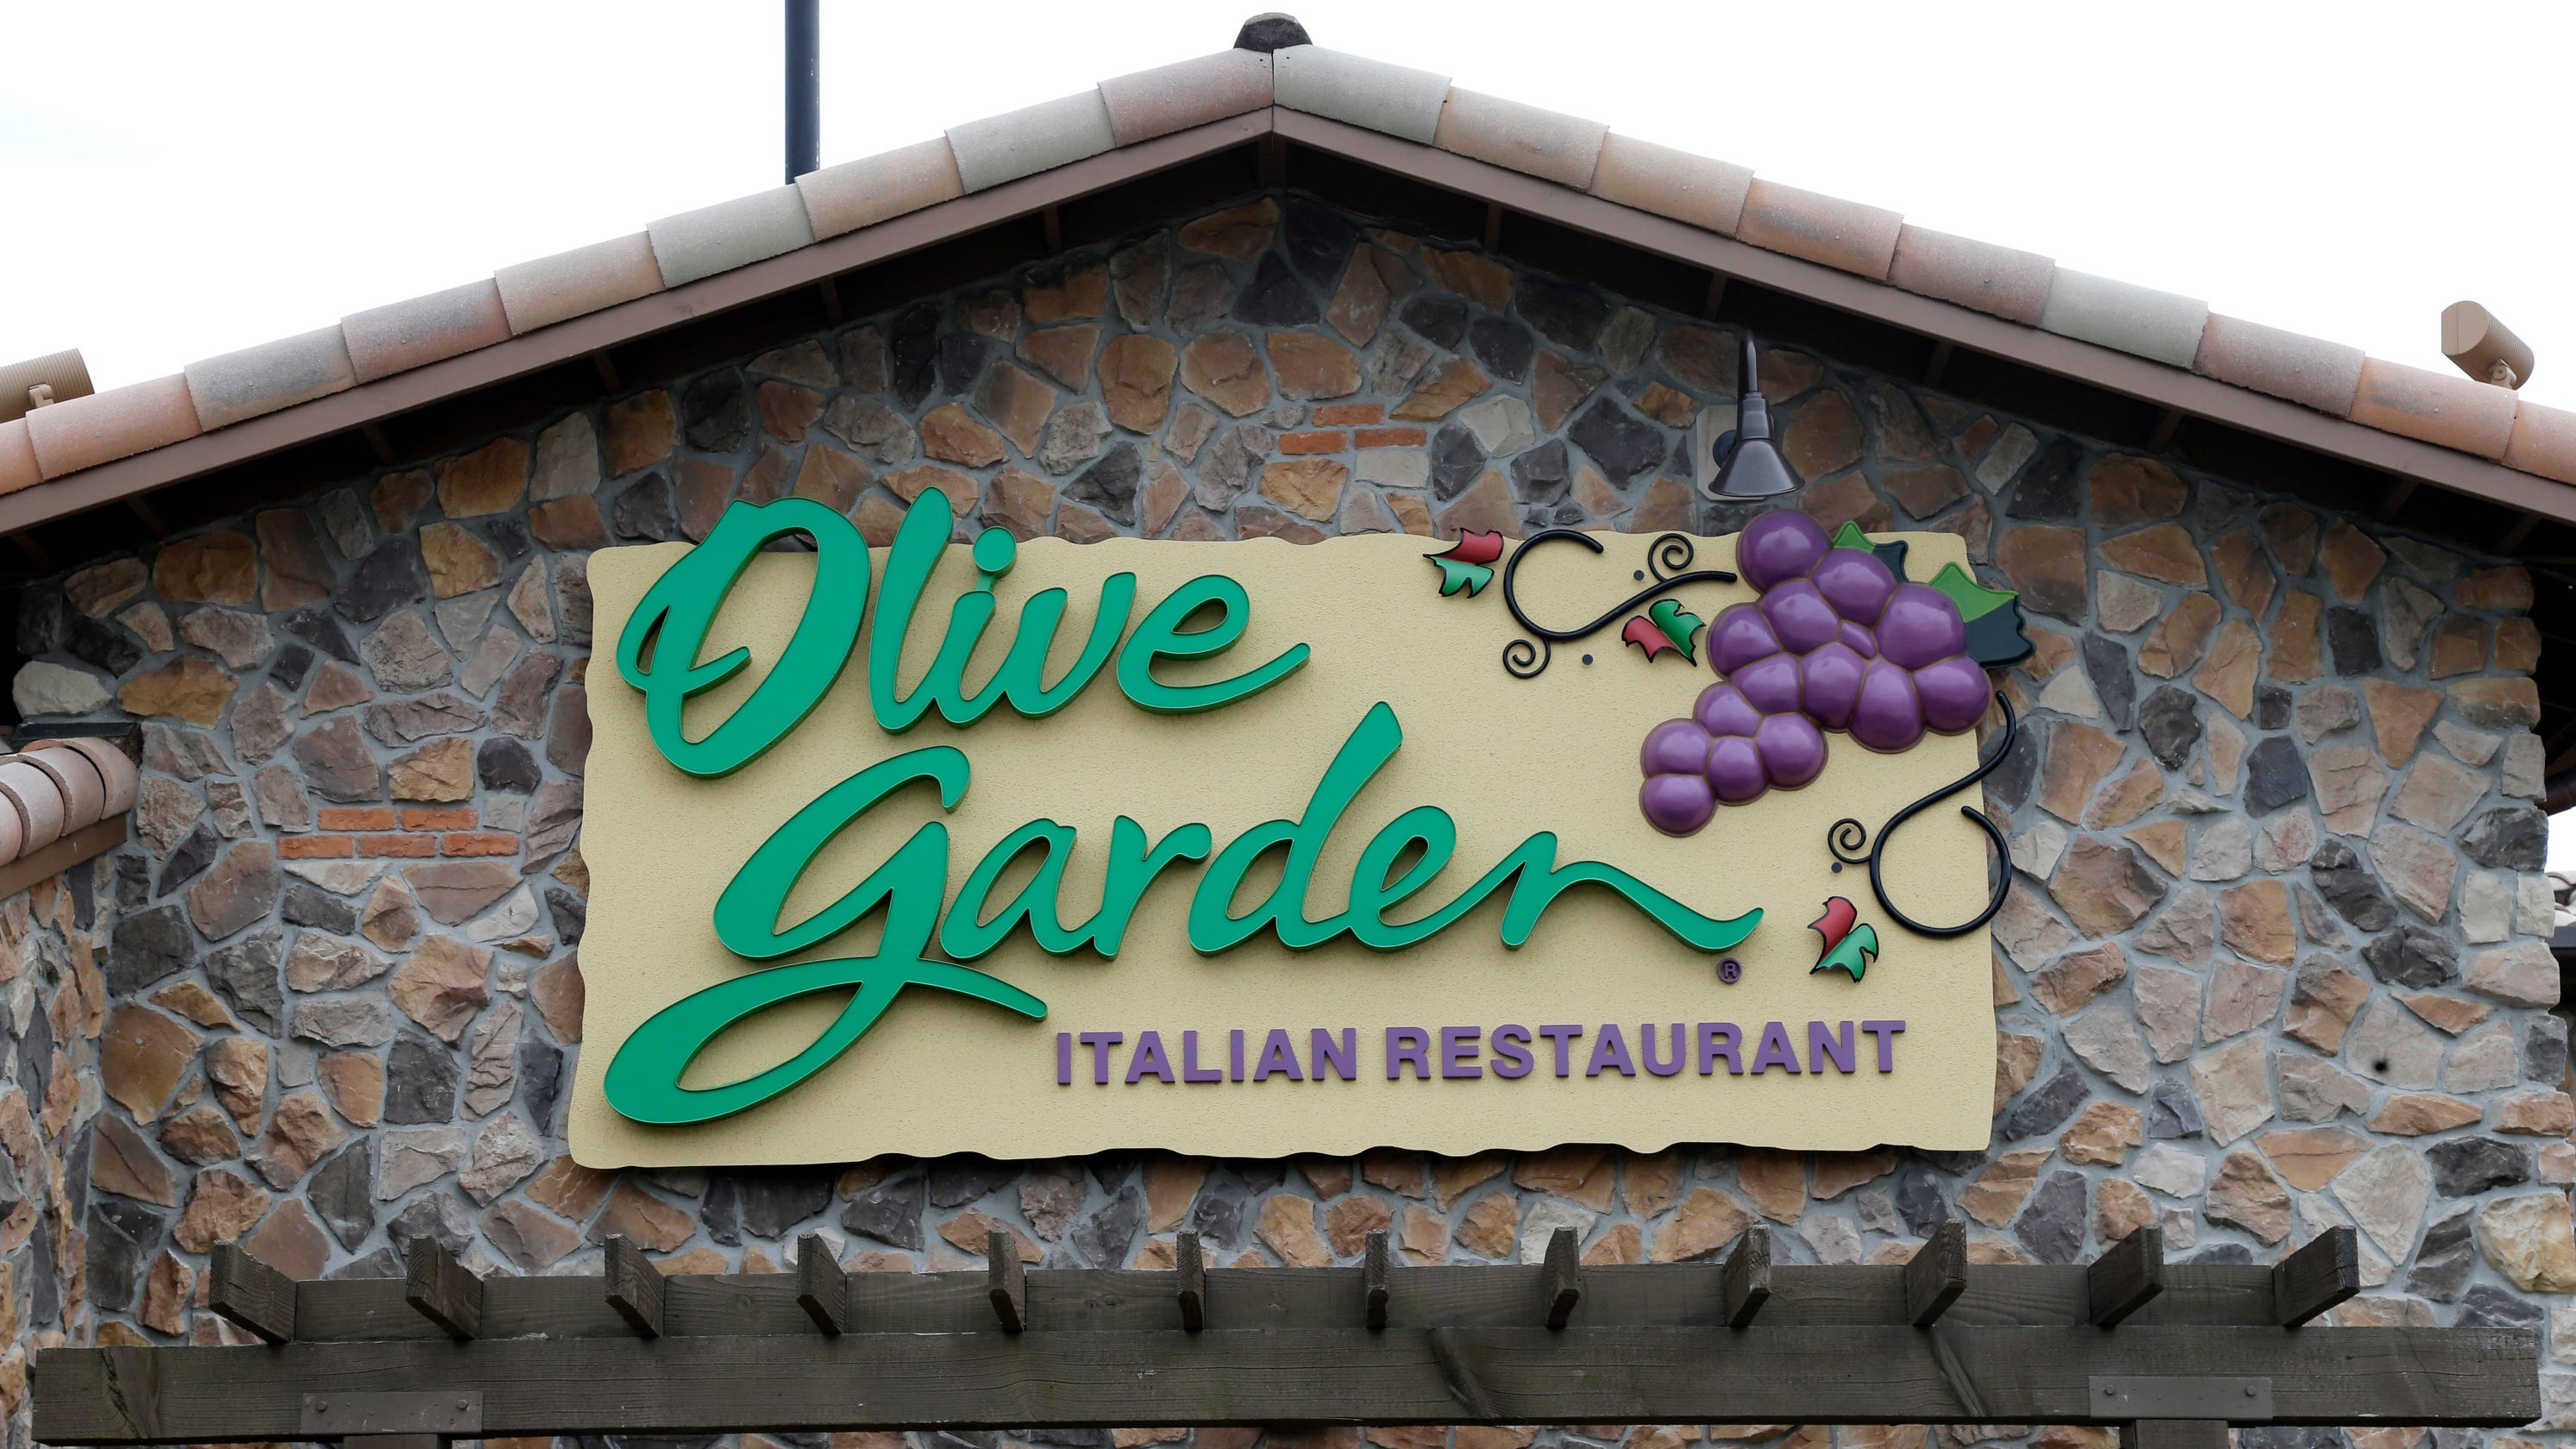 Menomonee Falls Olive Garden To Open Jan 27 In White Stone Station